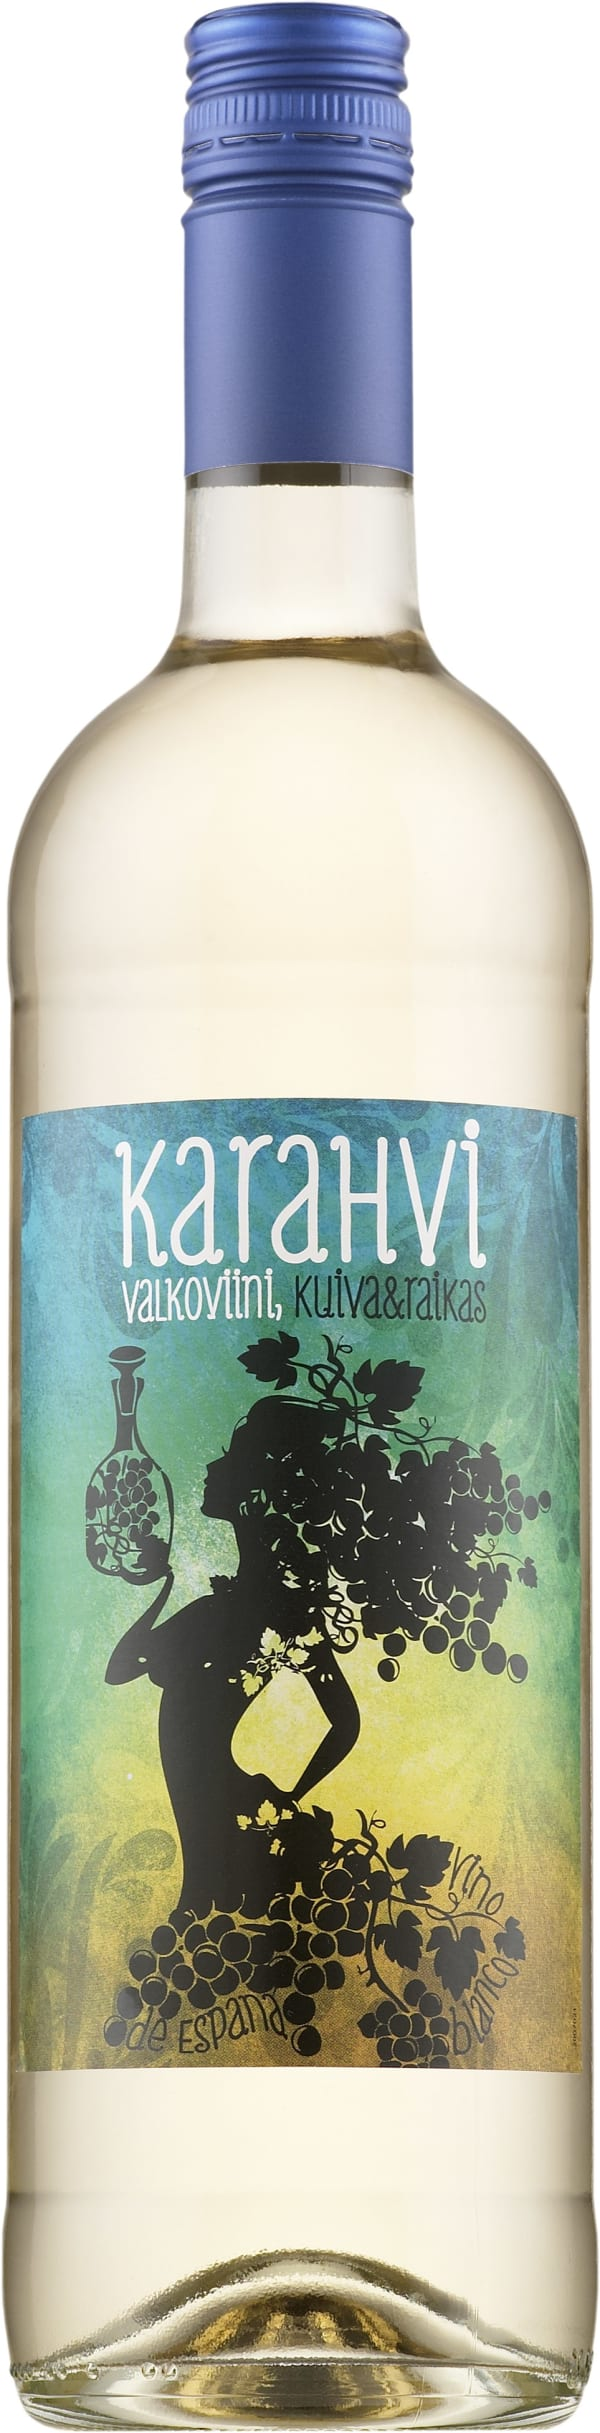 Karahvivalkoviini